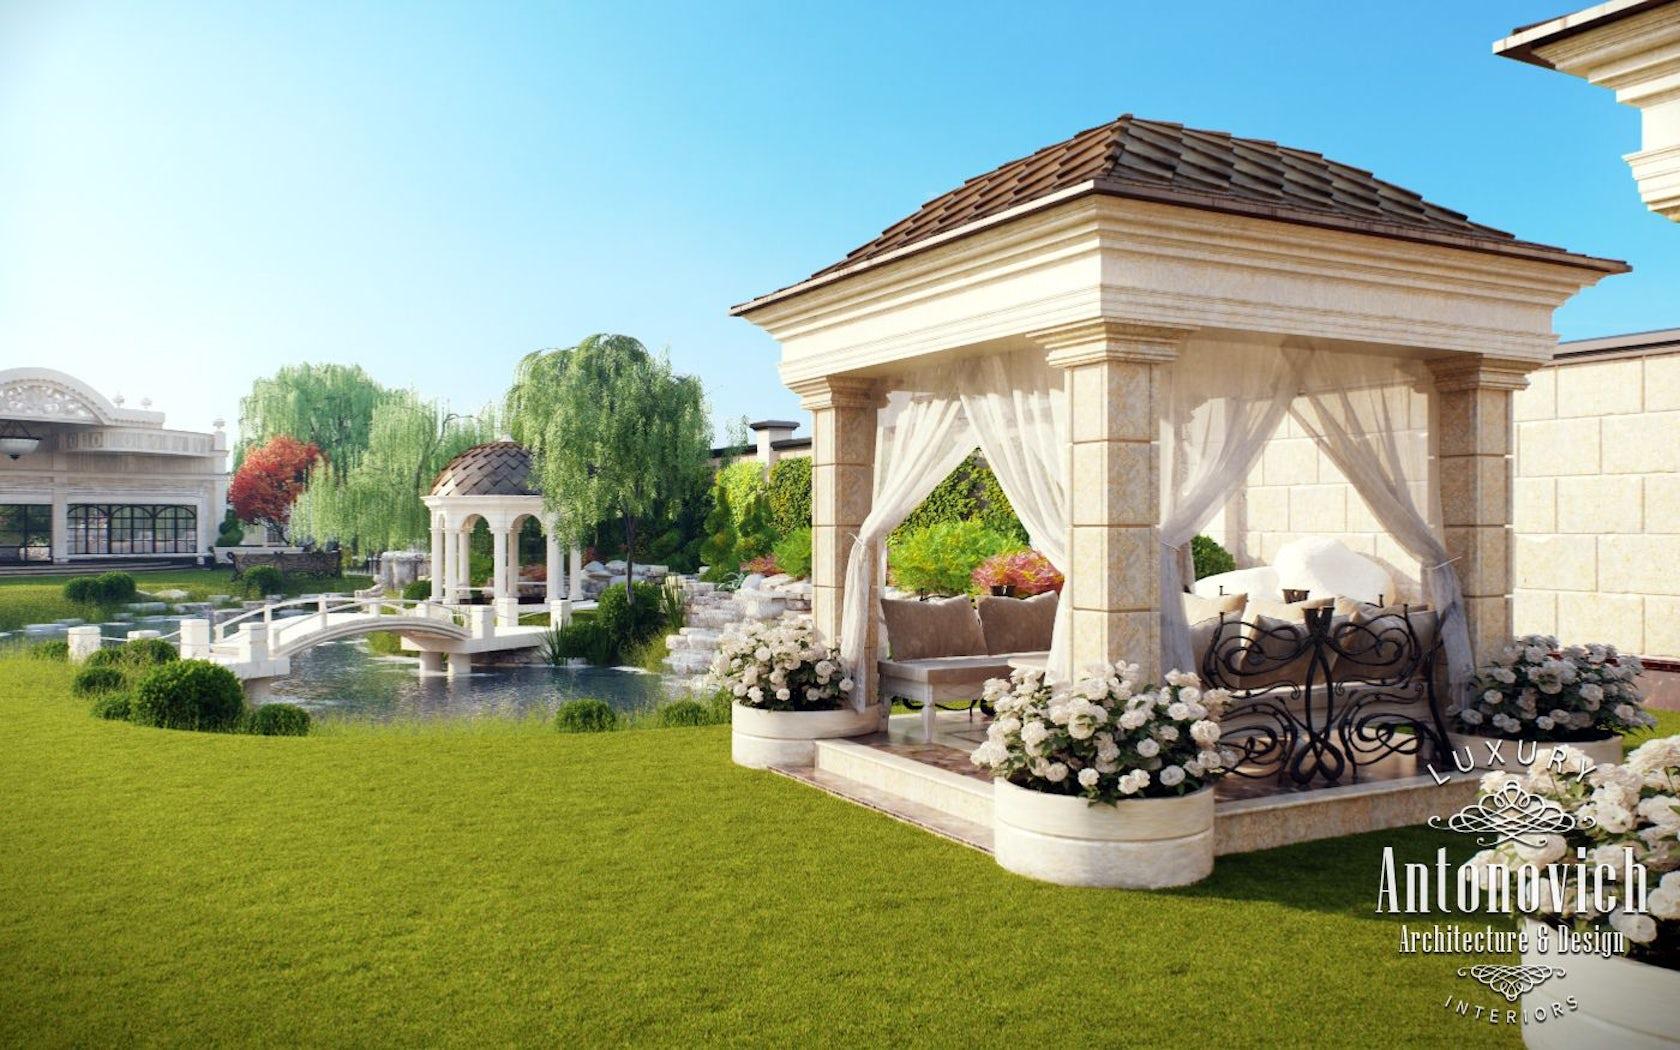 Garden landscaping dubai from luxury antonovich design on